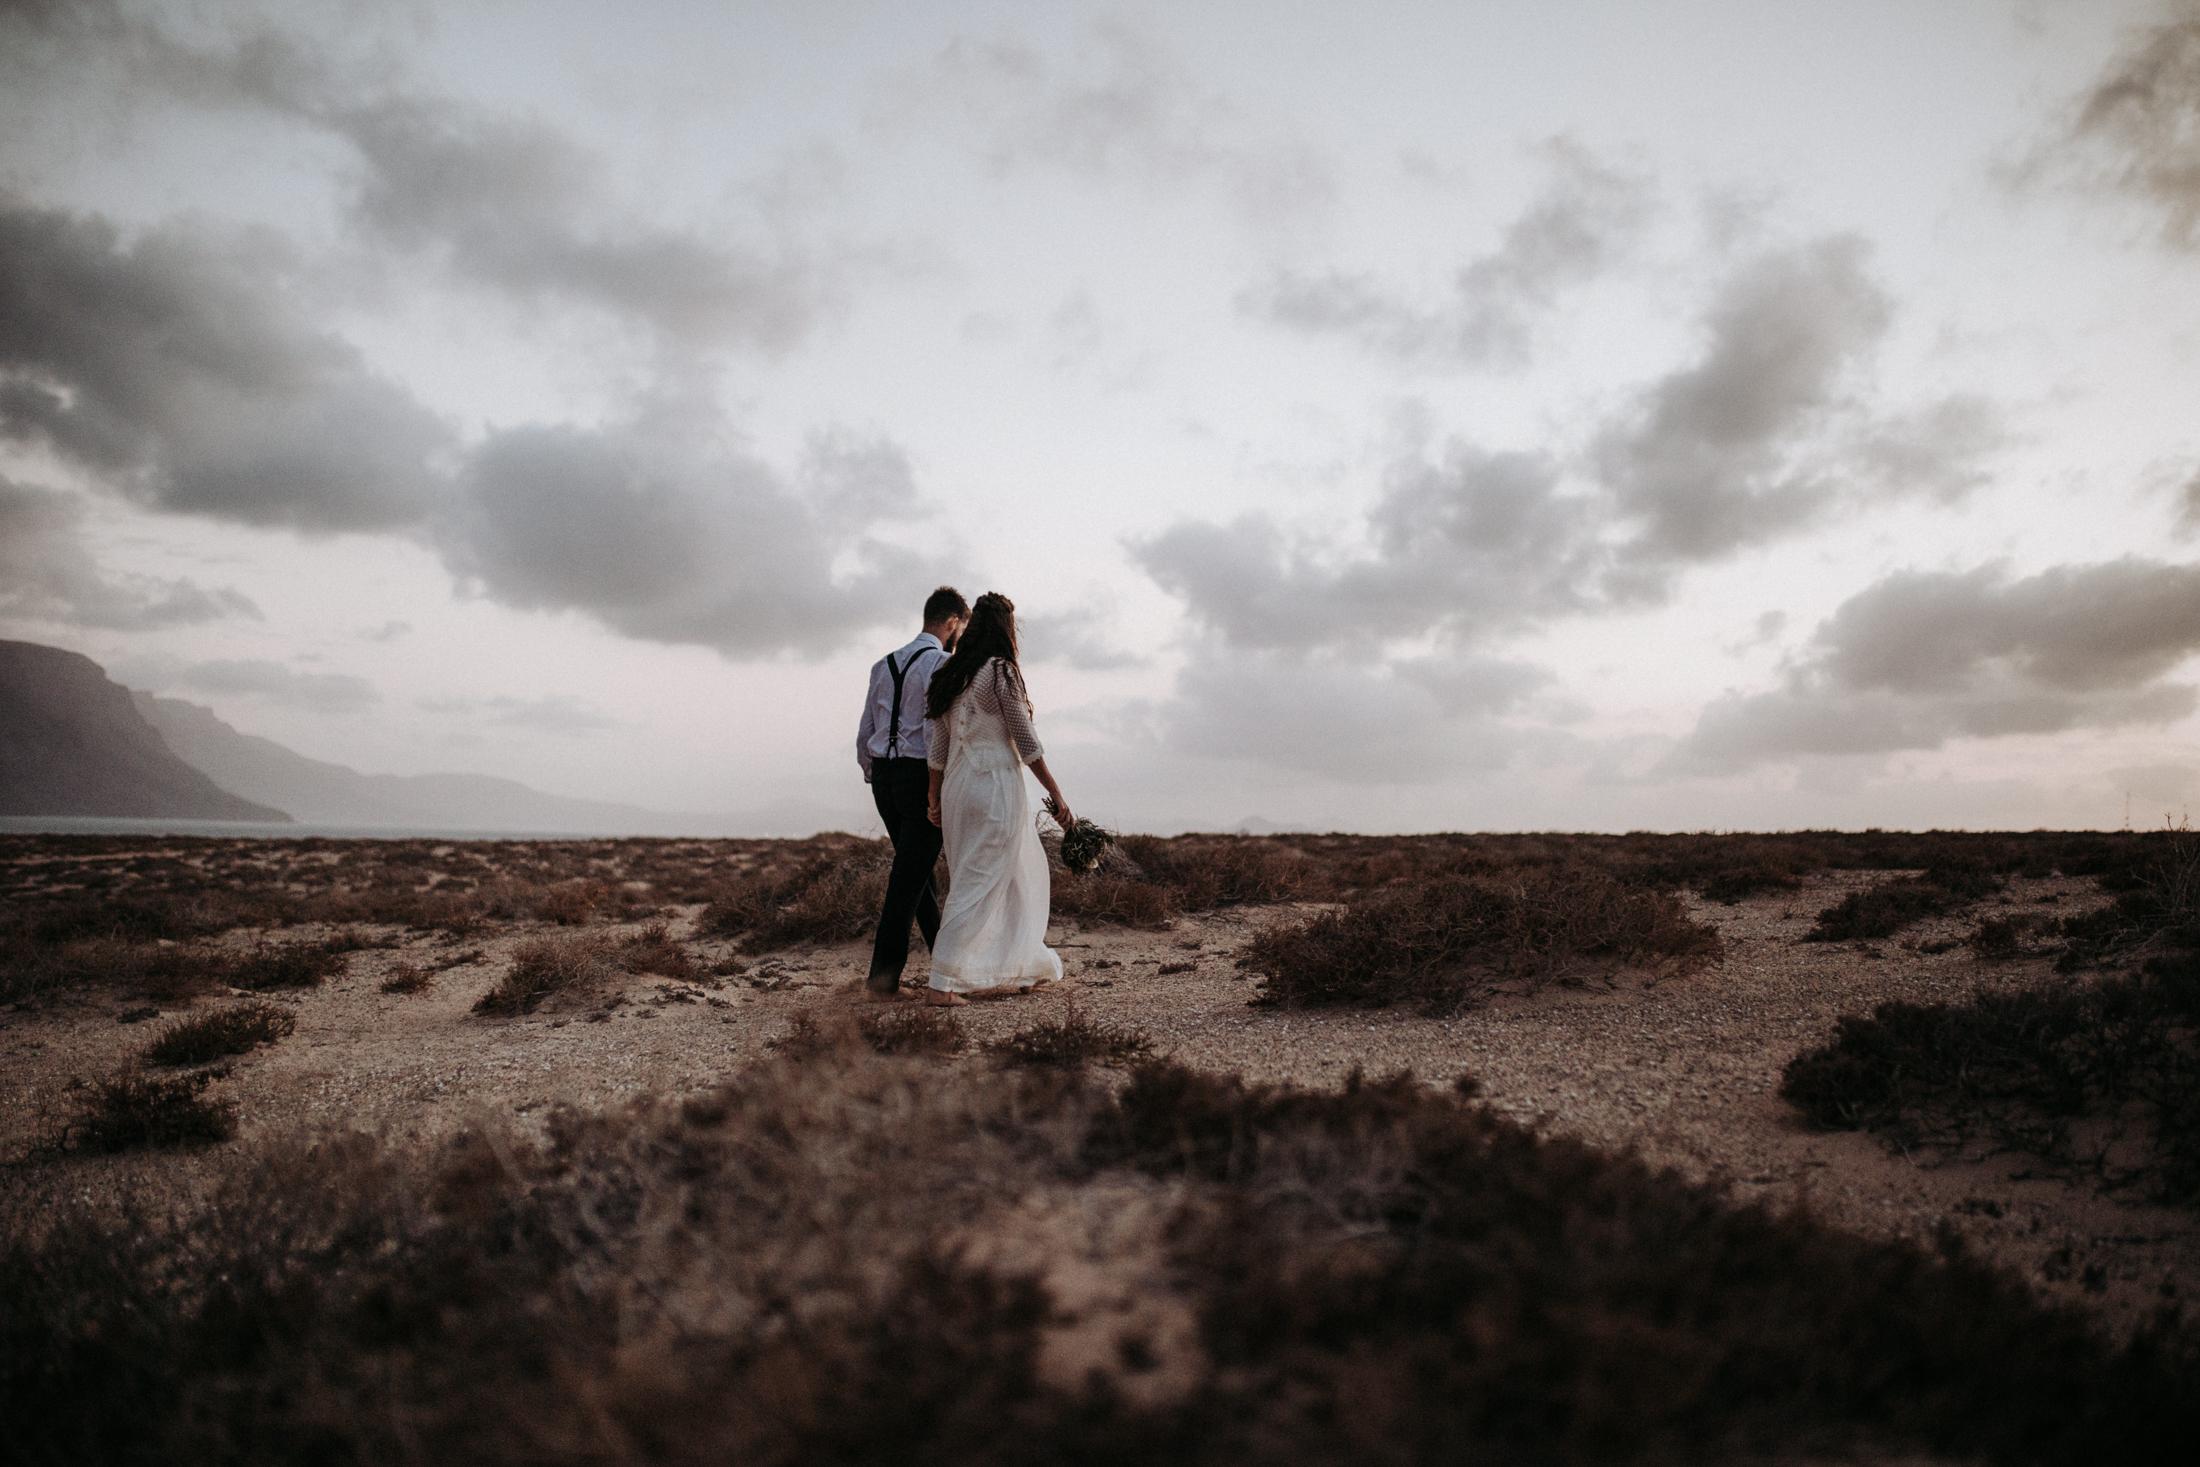 Wedding_Photographer_Mallorca_Daniela-Marquardt_Photography_CanaryIslands_Lanzarote_Iceland_Tuskany_Santorini_Portugal_Schweiz_Austria_Bayern_Elopement_Hochzeitsfotograf_45